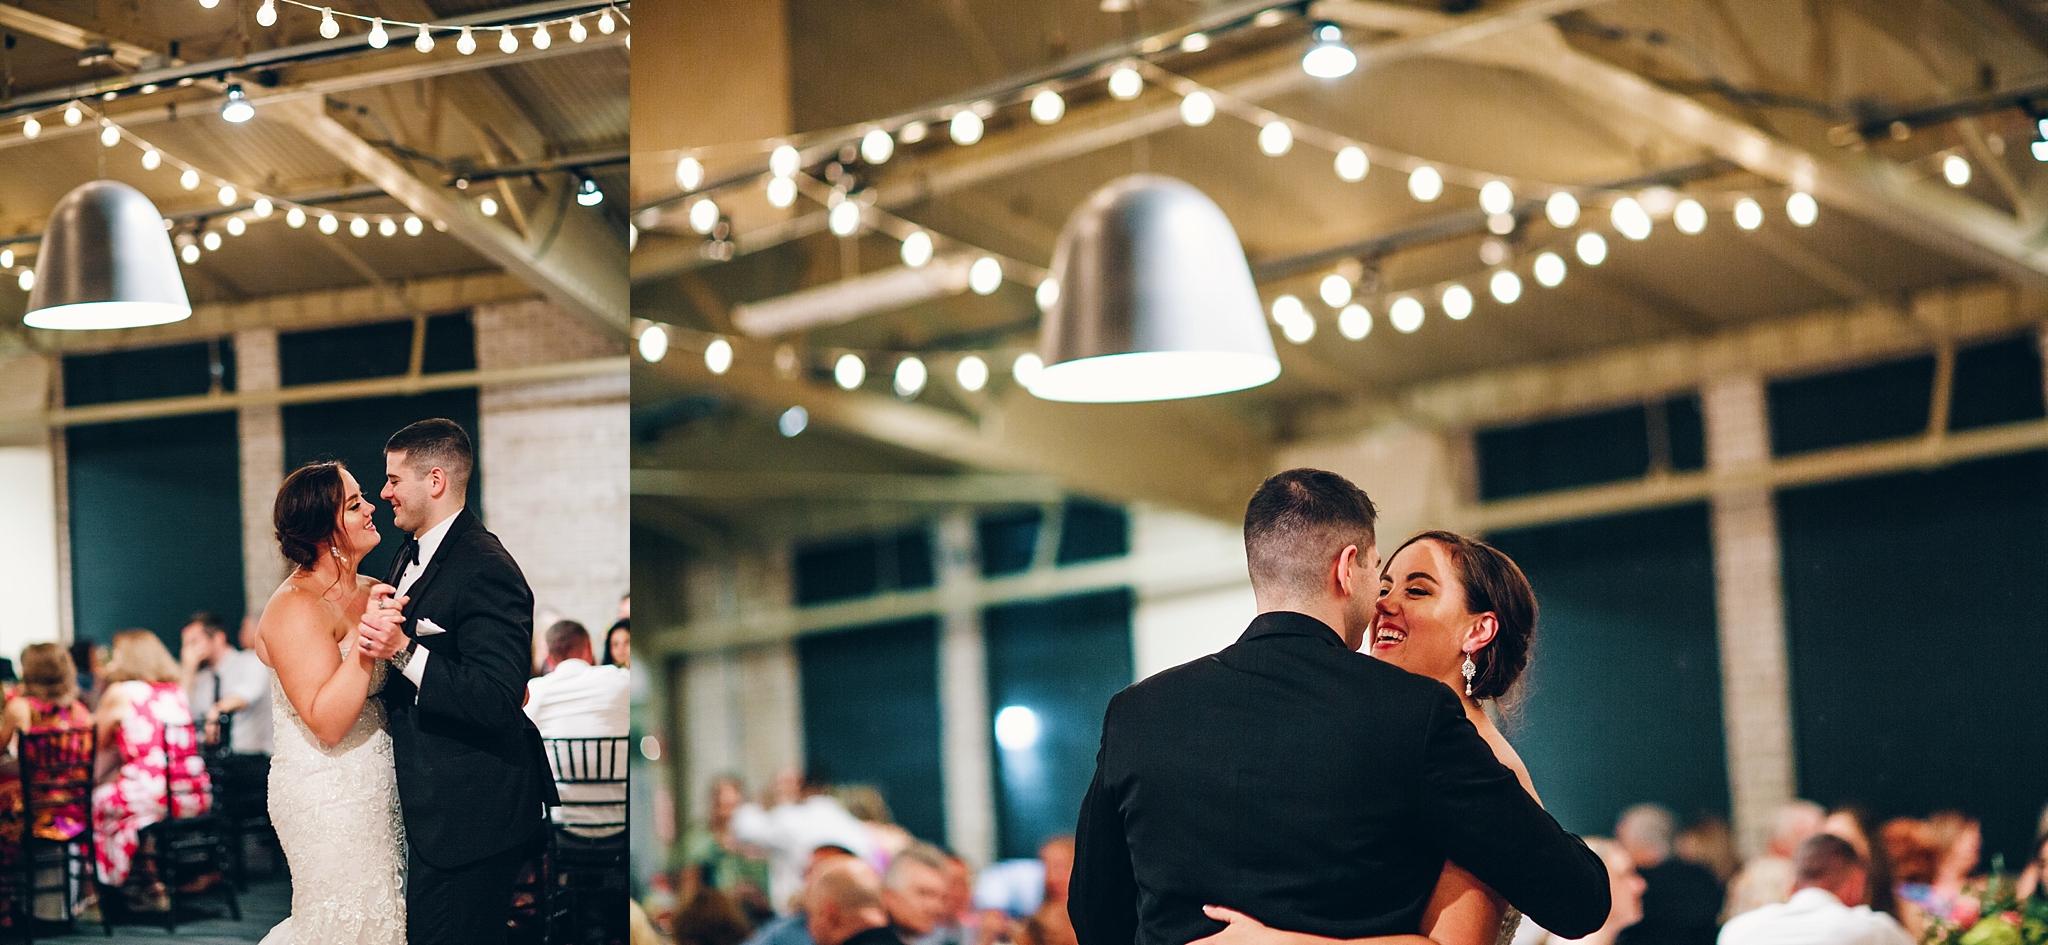 baker-lofts-holland-michigan-wedding-photographer_0393.jpg